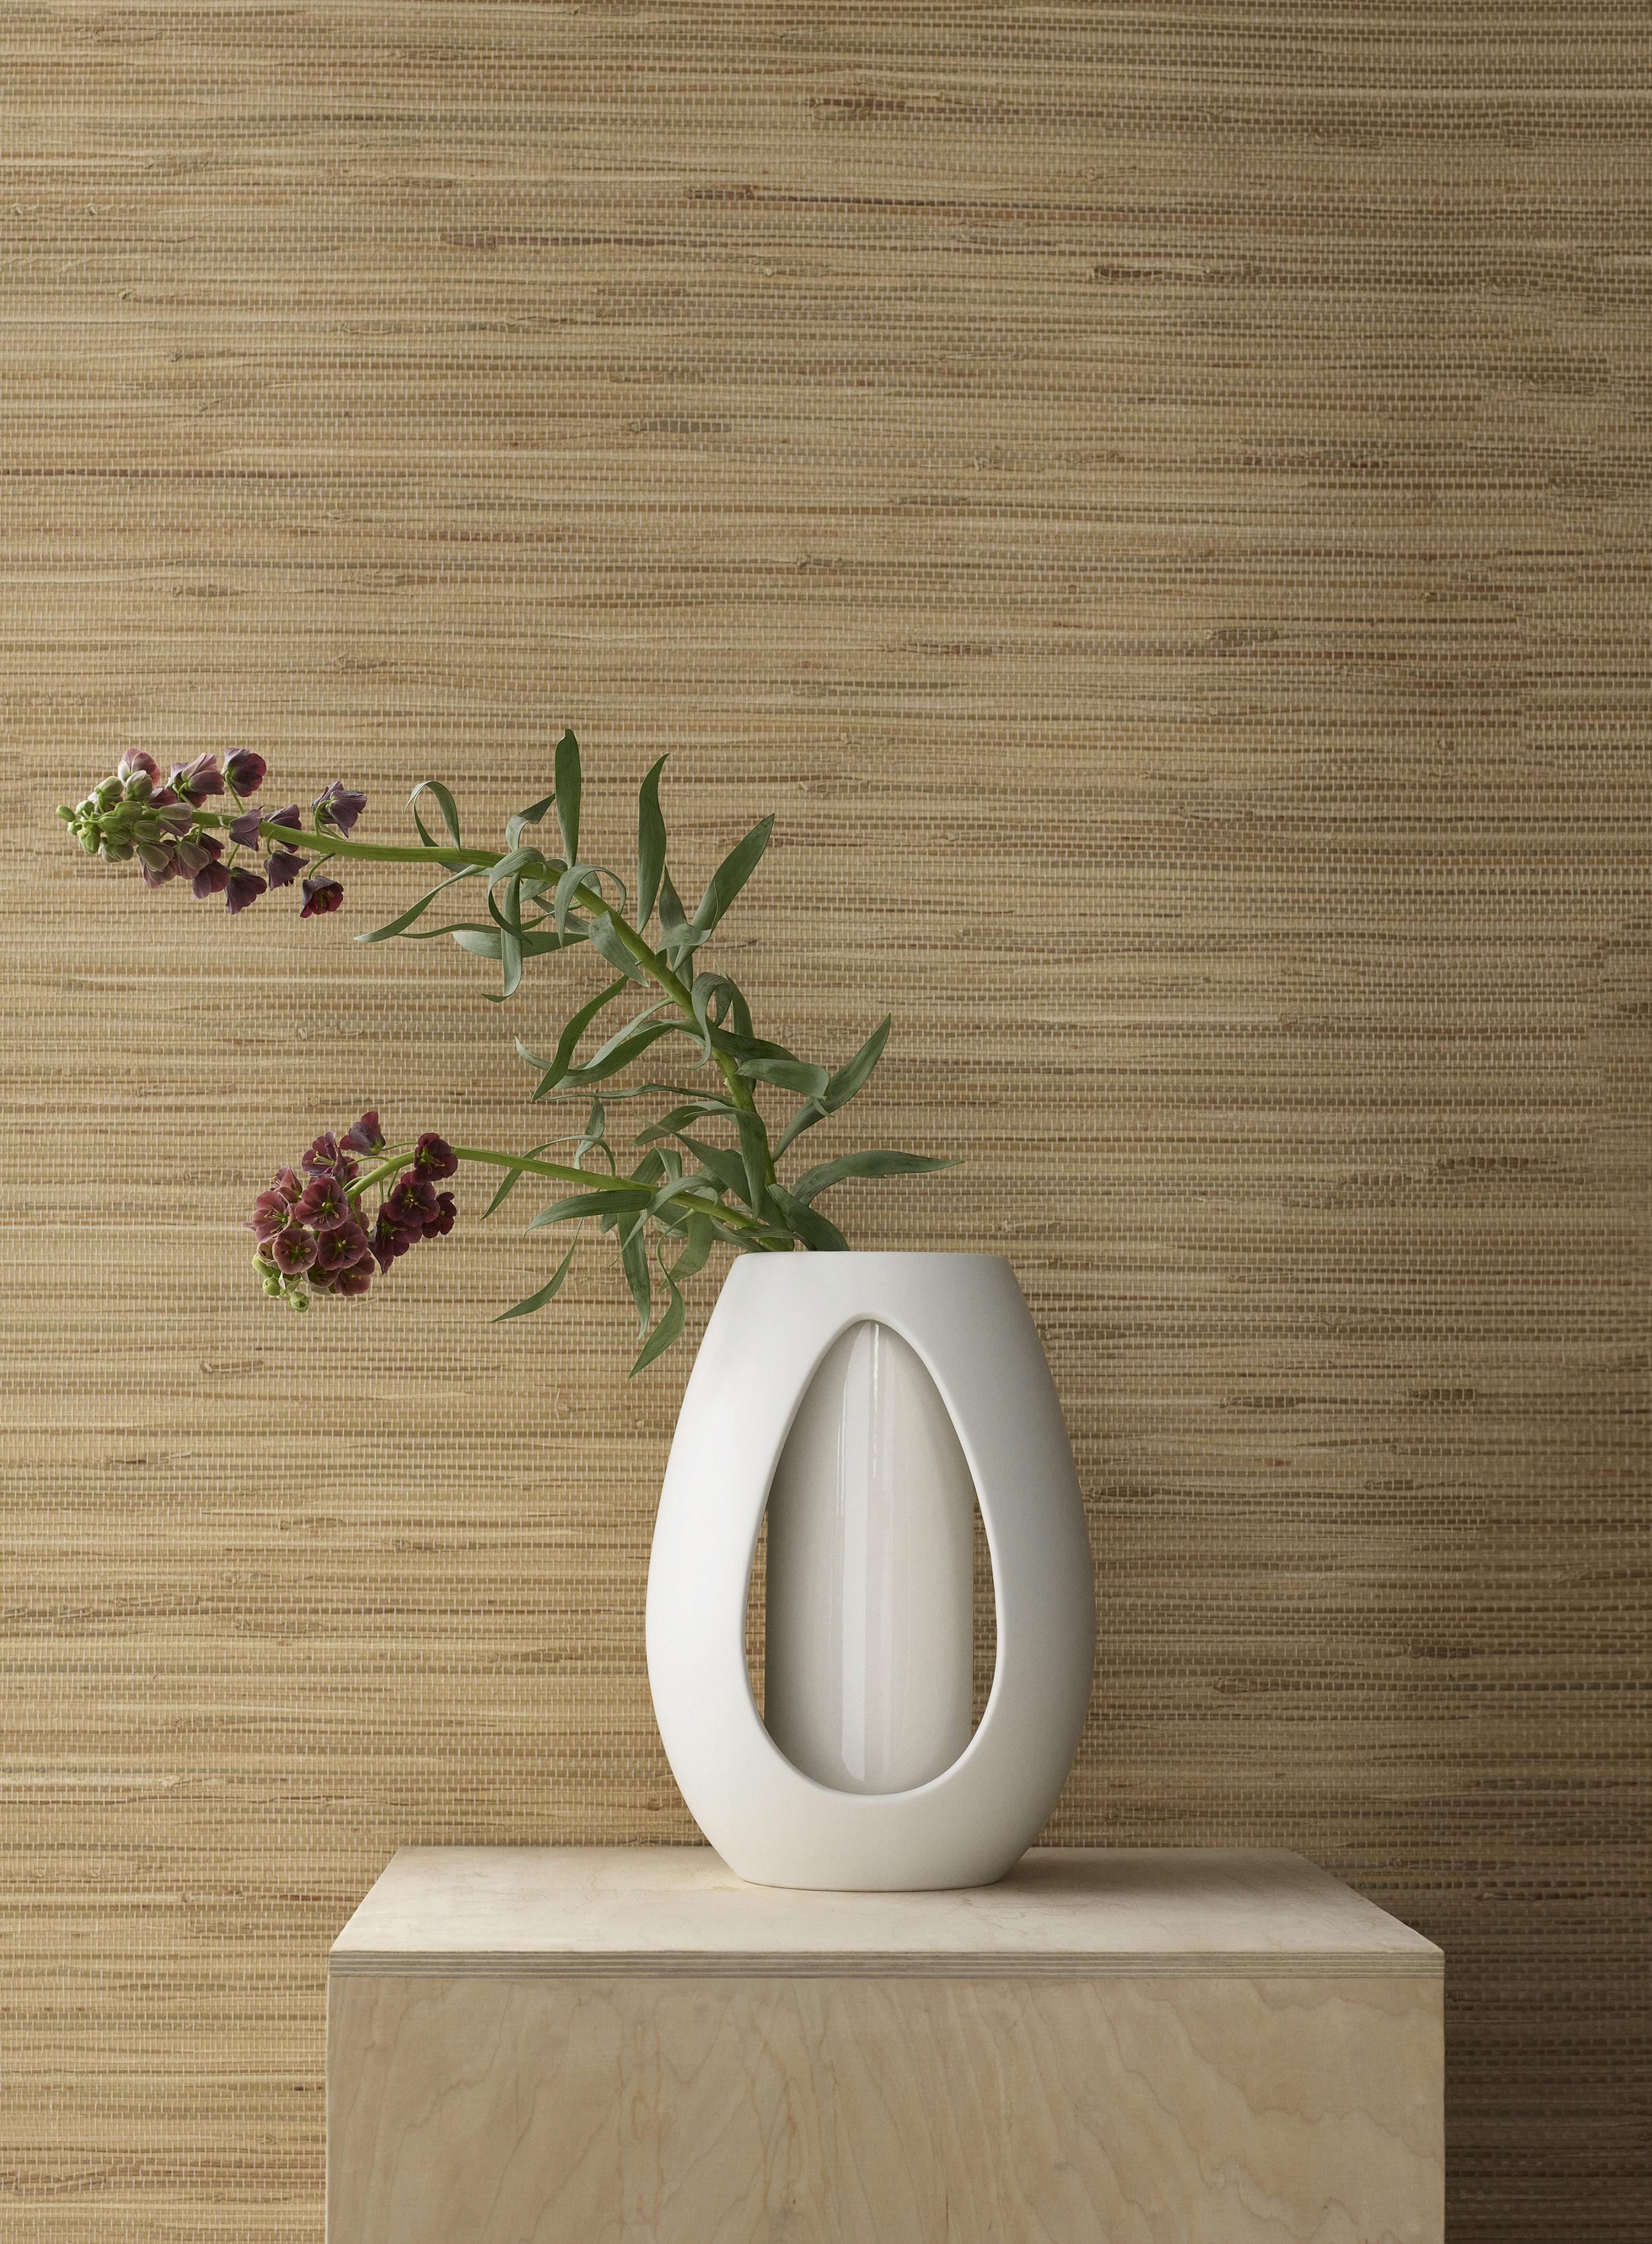 Kokong Vase  (H: 32 cm / 22 cm) aus dunkelbraunem bzw. naturweißem Steinzeug, 134.90 / 94.90 EUR